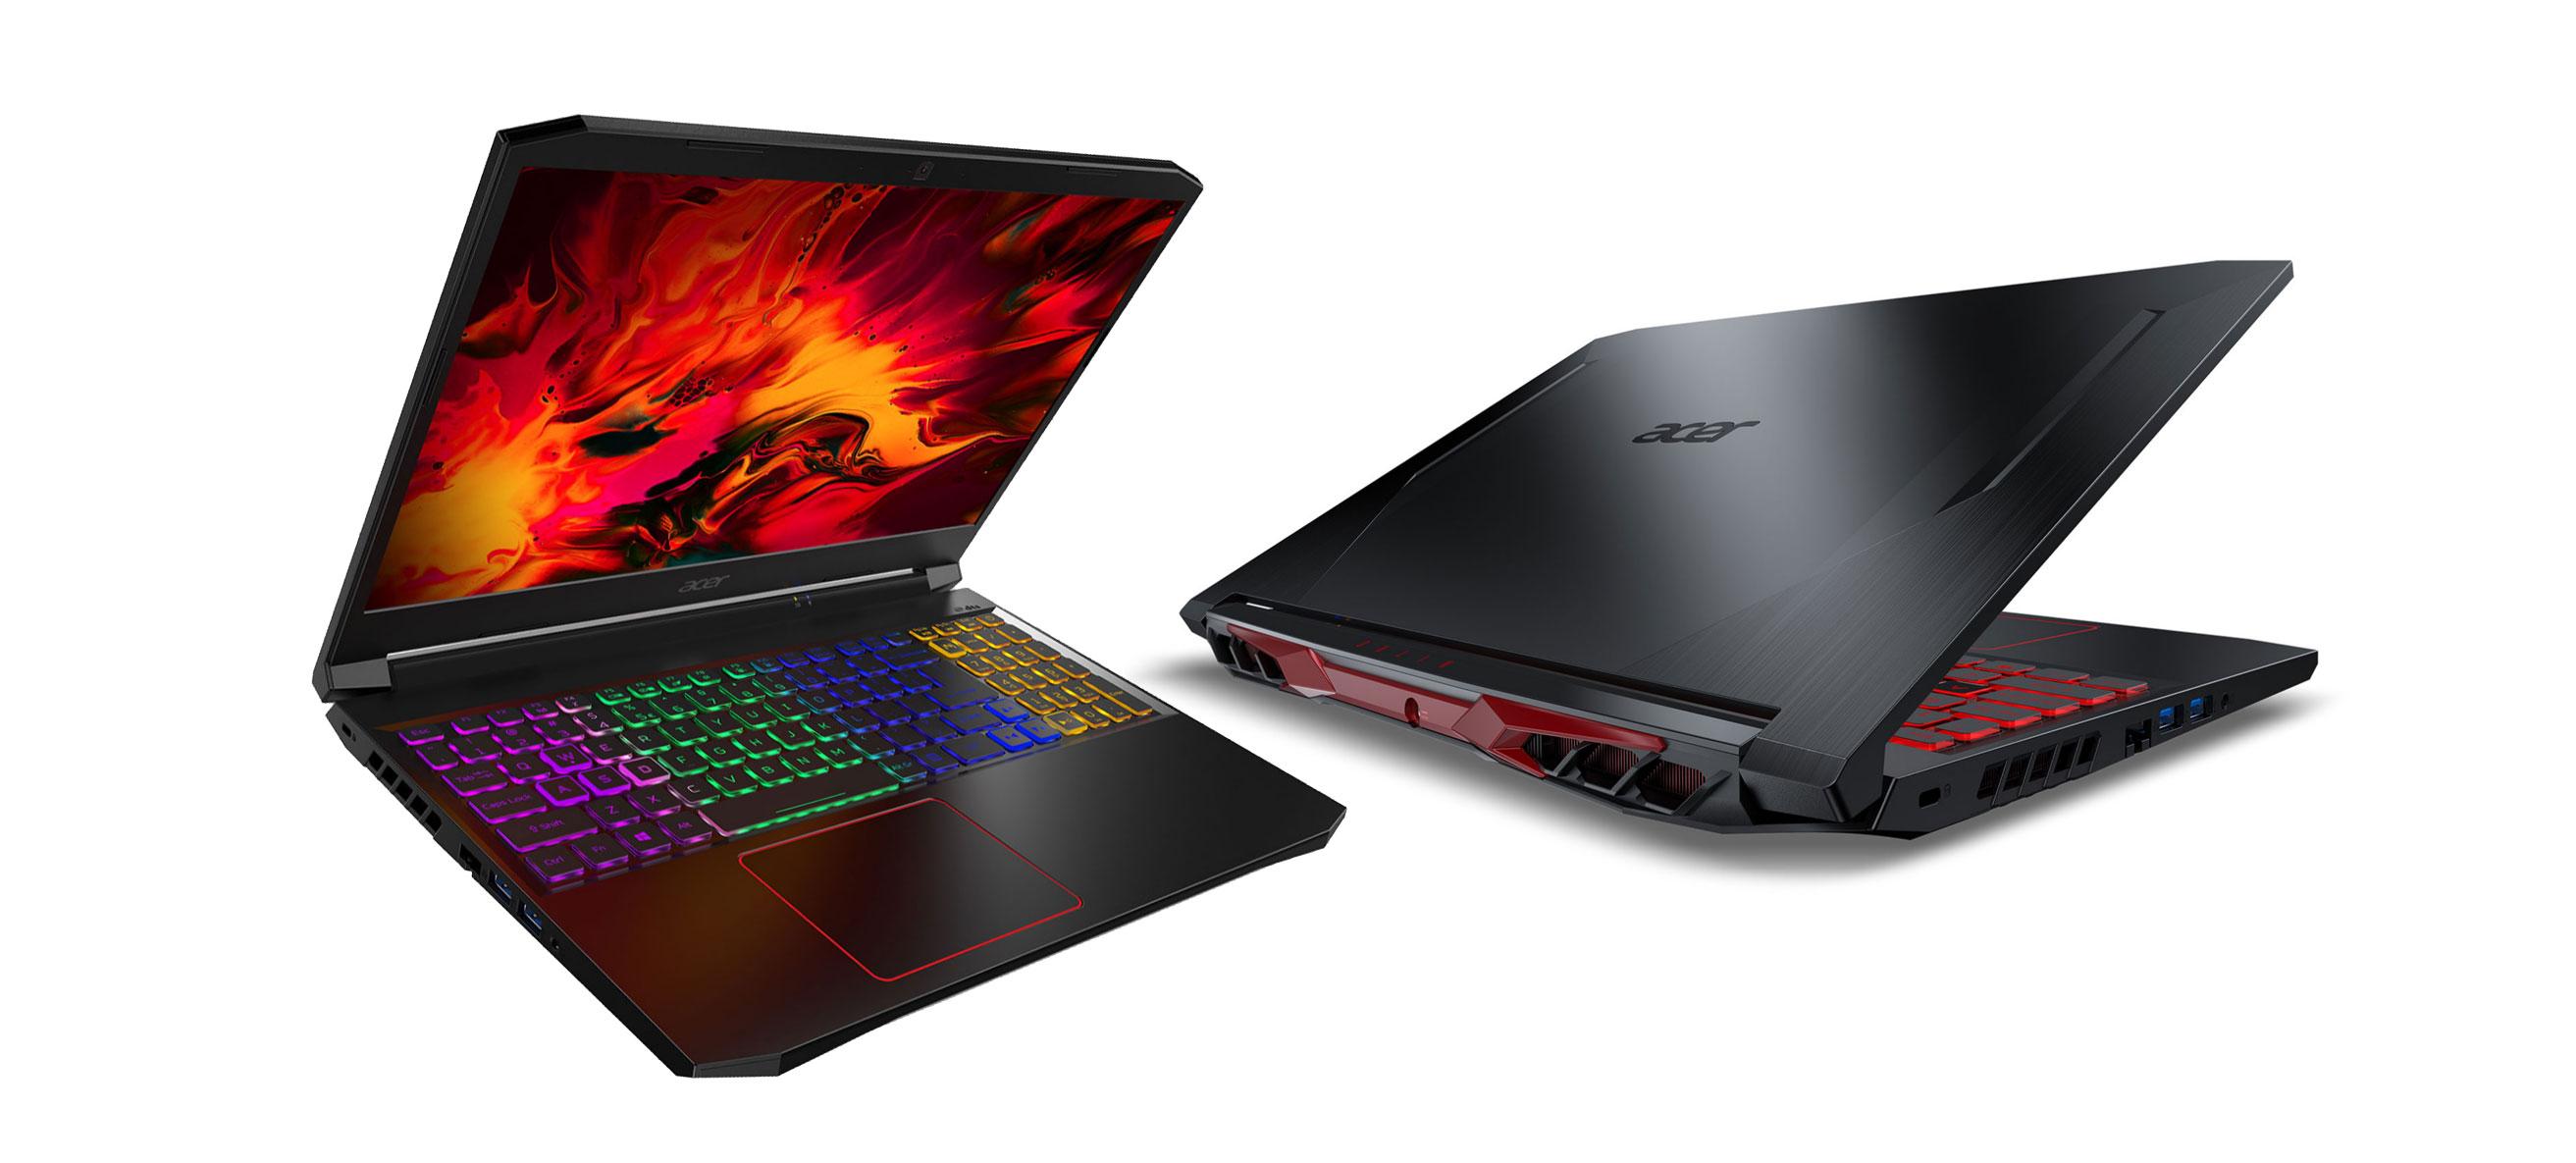 Acer Nitro 5 and Lenovo Legion 5 get AMD Ryzen versions, vs Asus TUF A15,  MSI Bravo 15